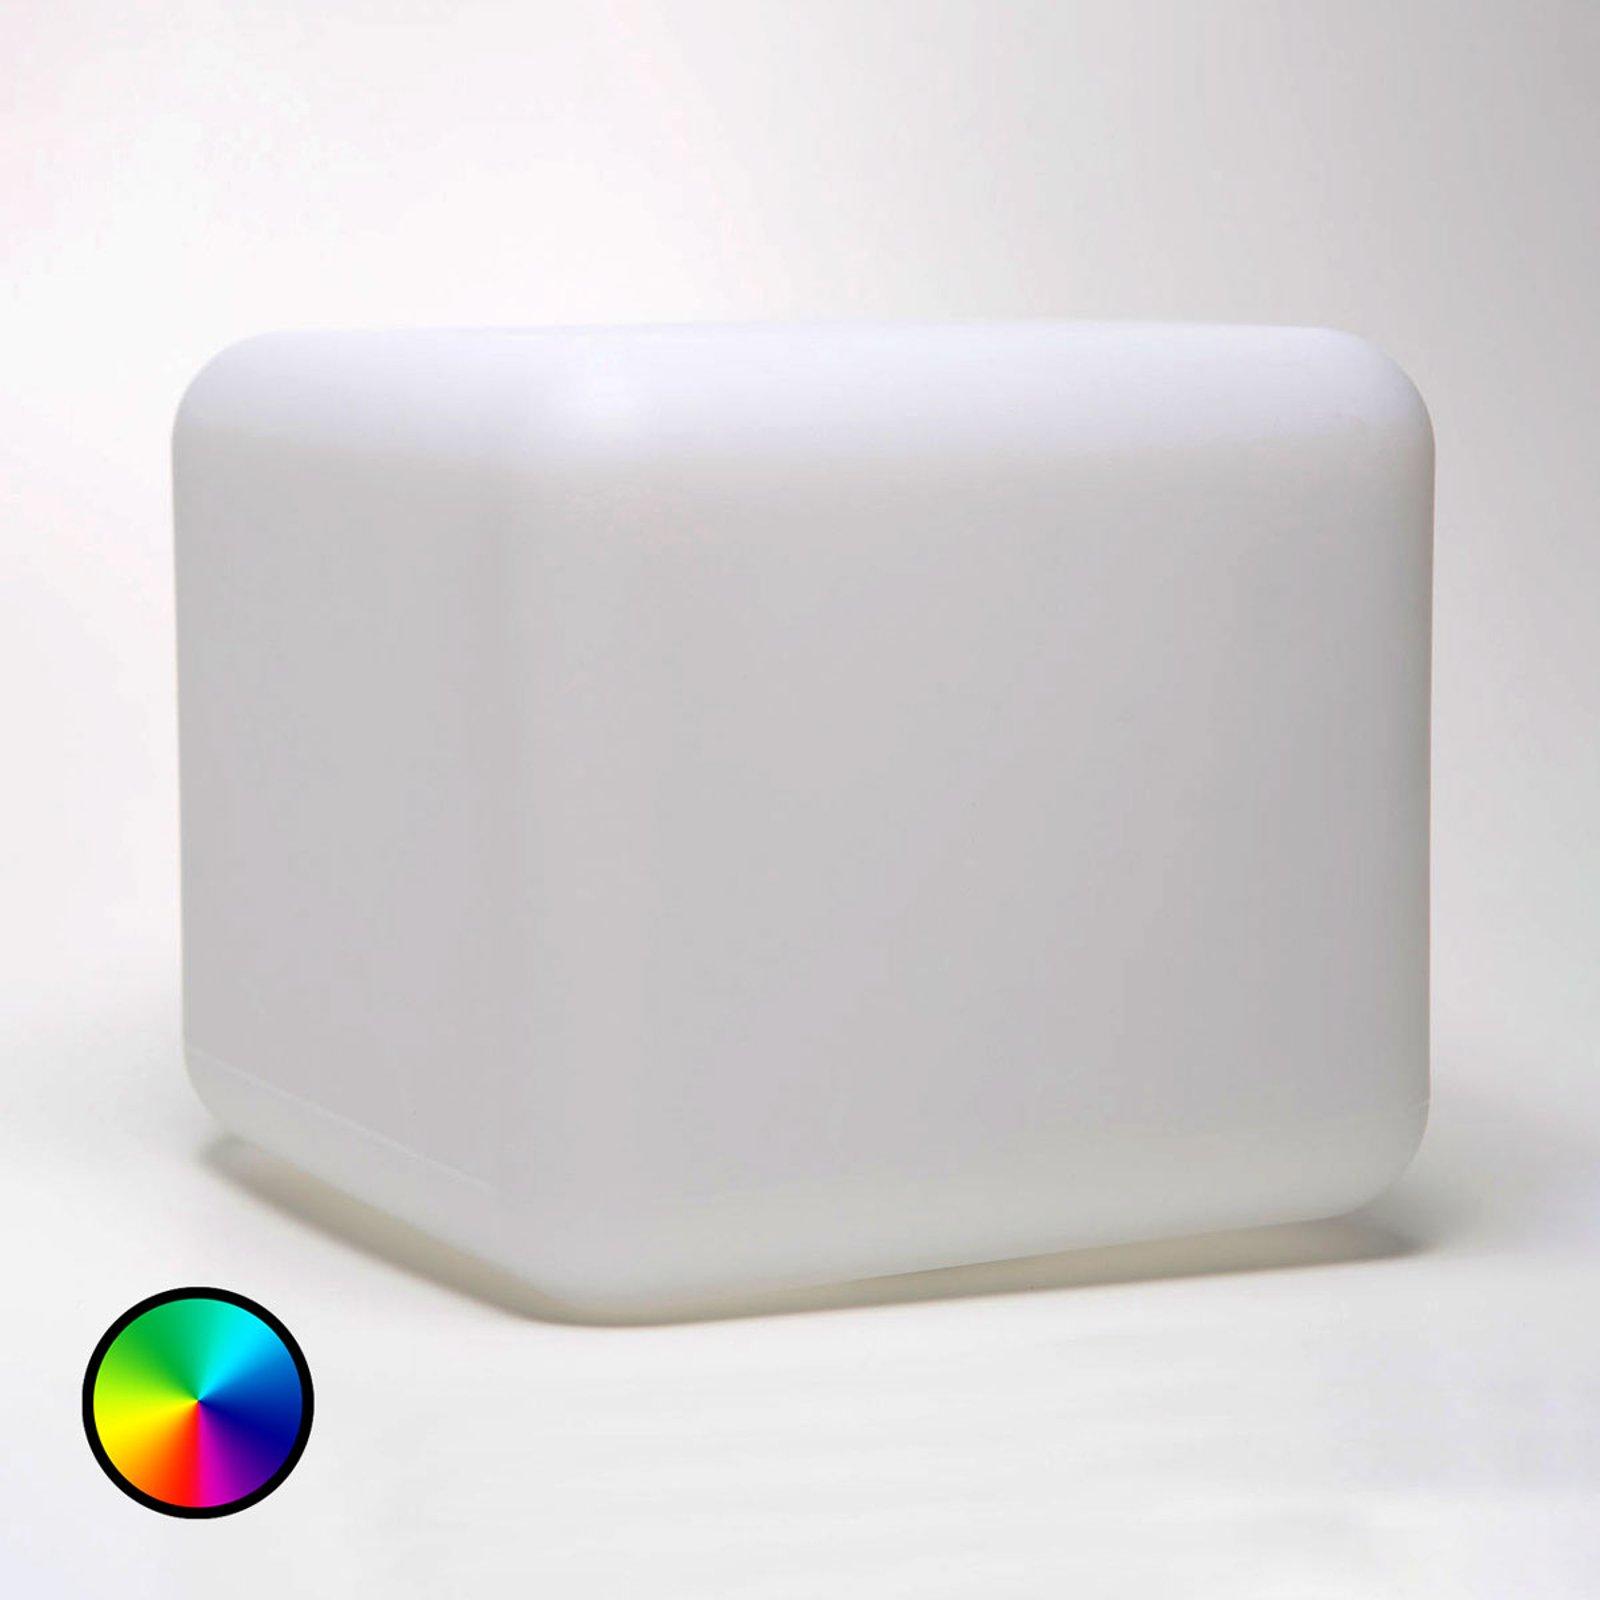 Deko-bordlampe Dice S, styrbar via app RGBW 16 cm